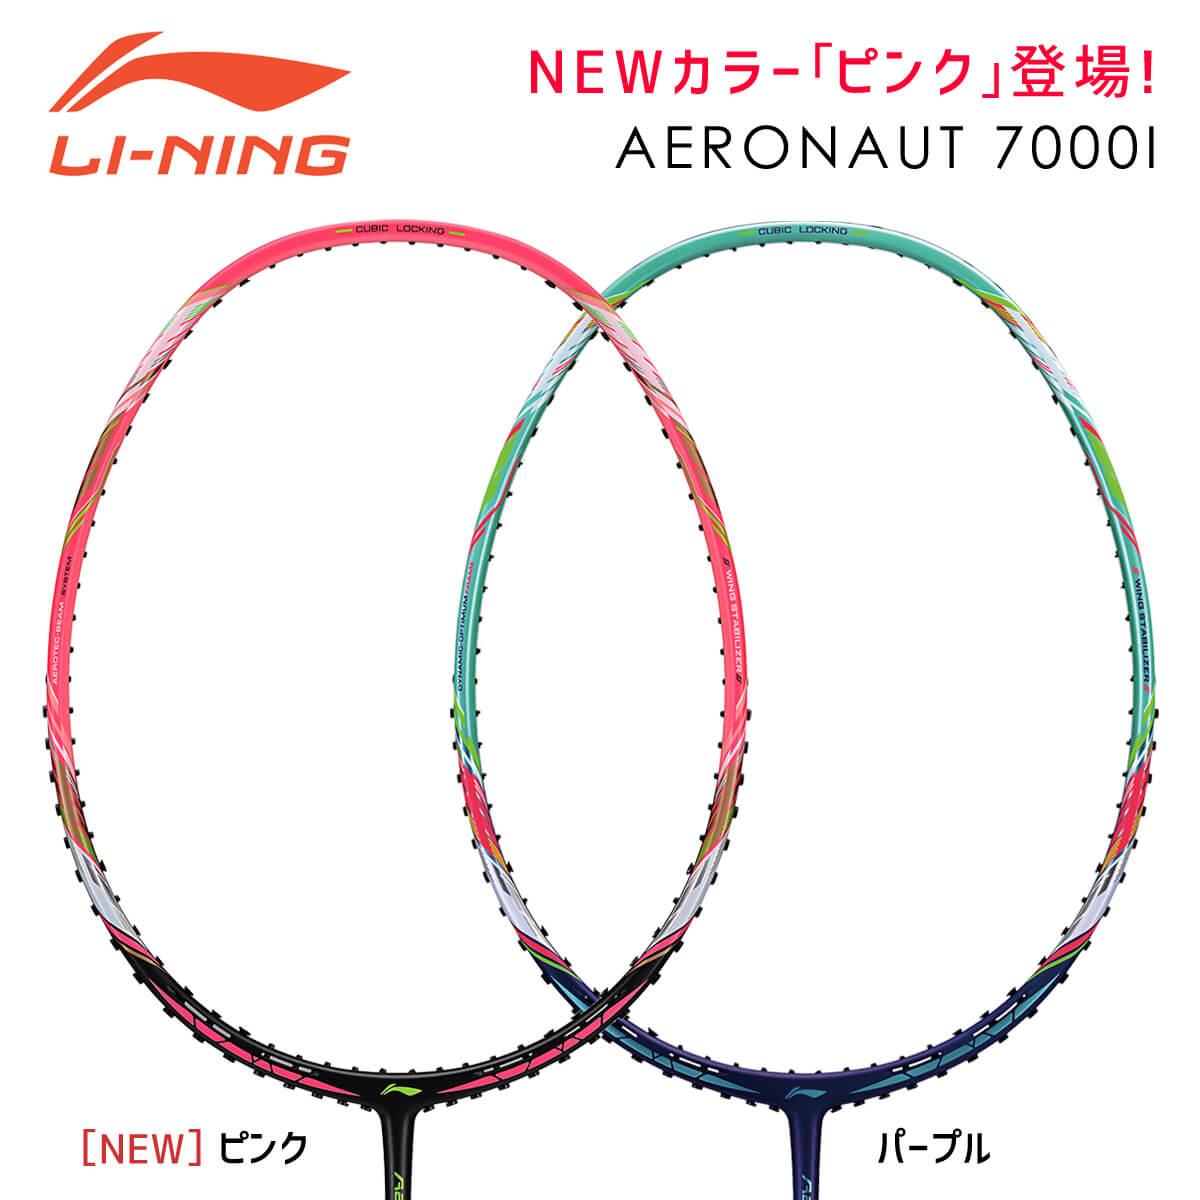 LI-NING AERONAUT 7000I(AN7000I) 風洞設計 バドミントンラケット リーニン【オススメガット&ガット張り工賃無料】